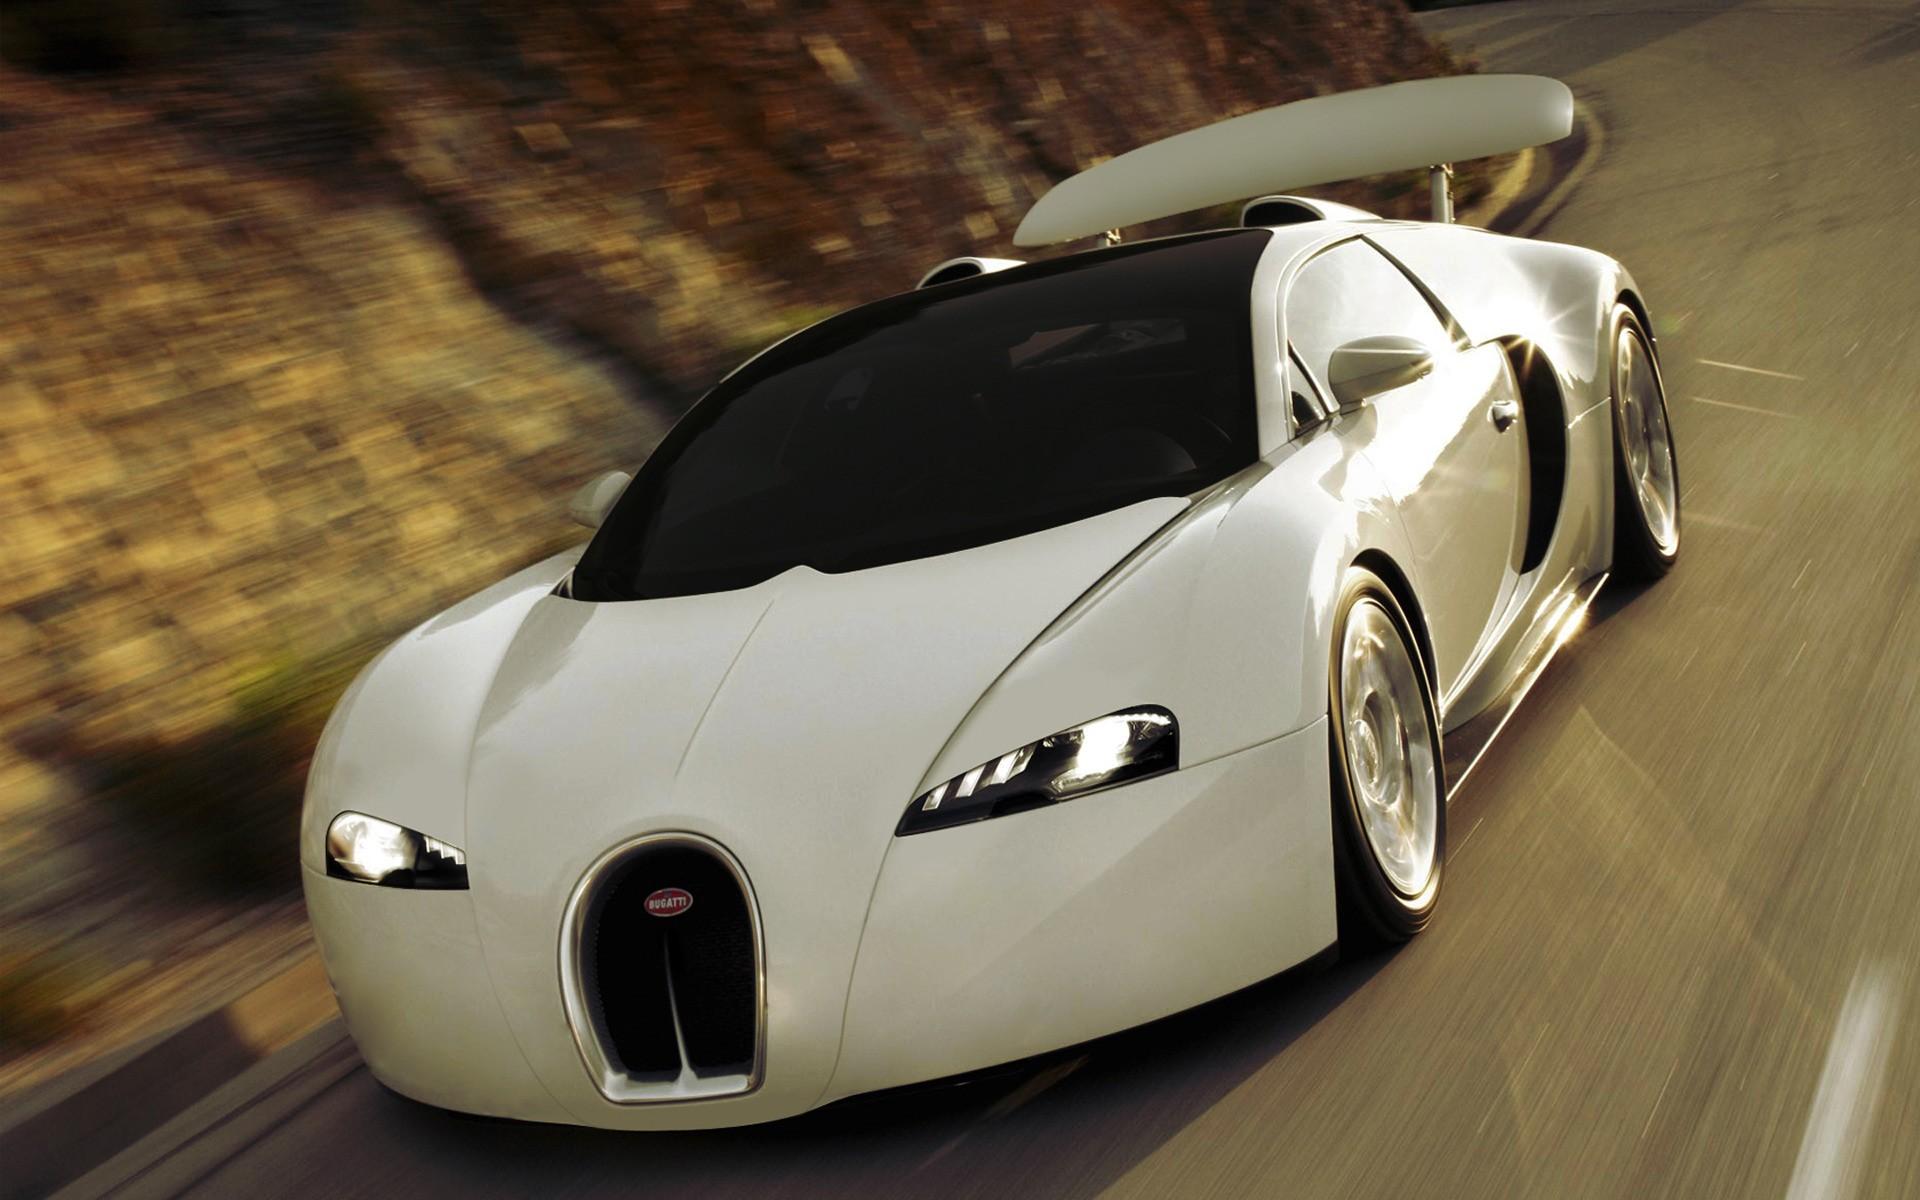 White cars bugatti veyron bugatti vehicles white cars million dollar